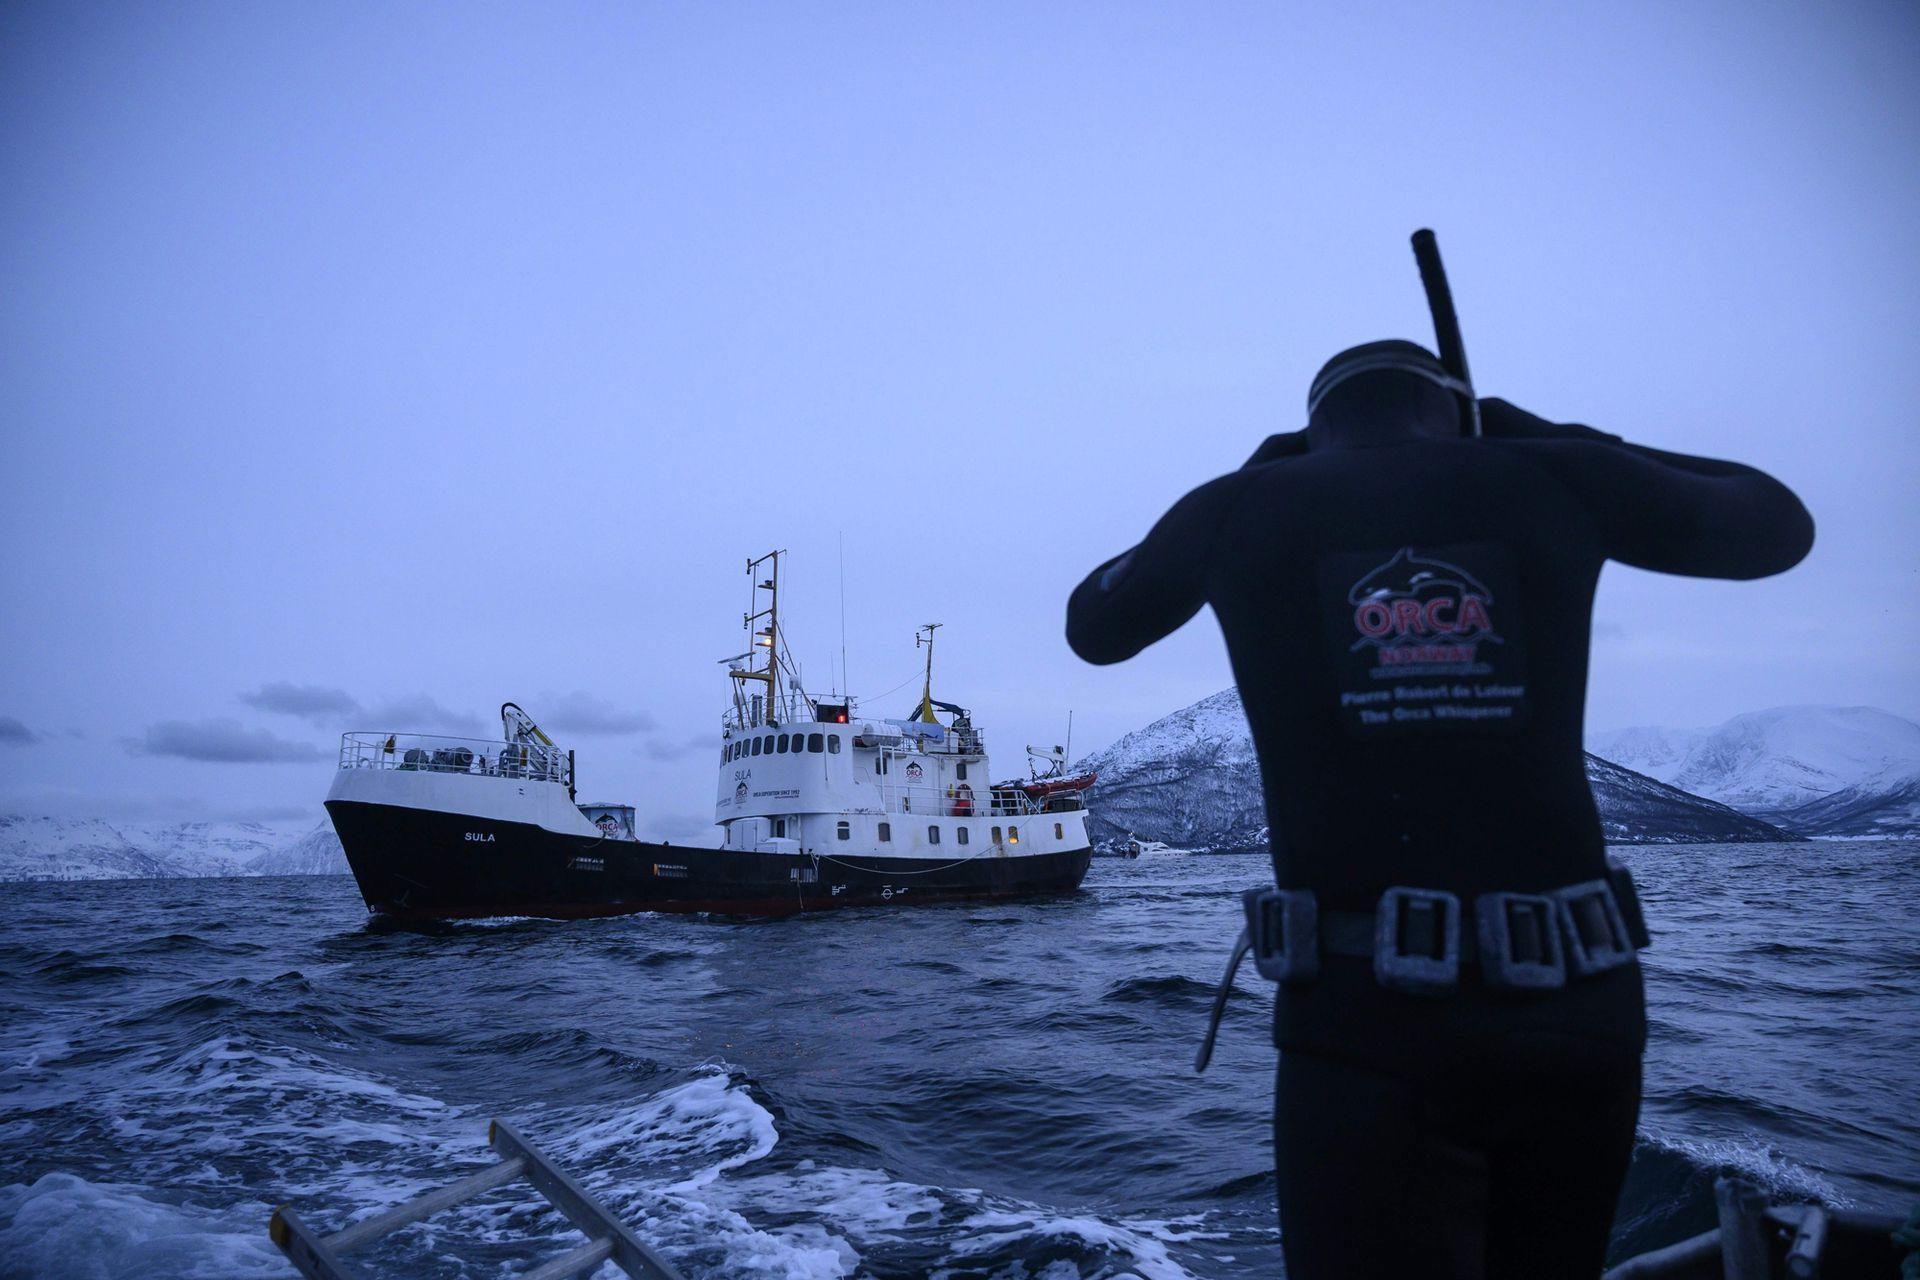 El experto en orcas francés Pierre Robert De Latour busca orcas desde un bote de aluminio